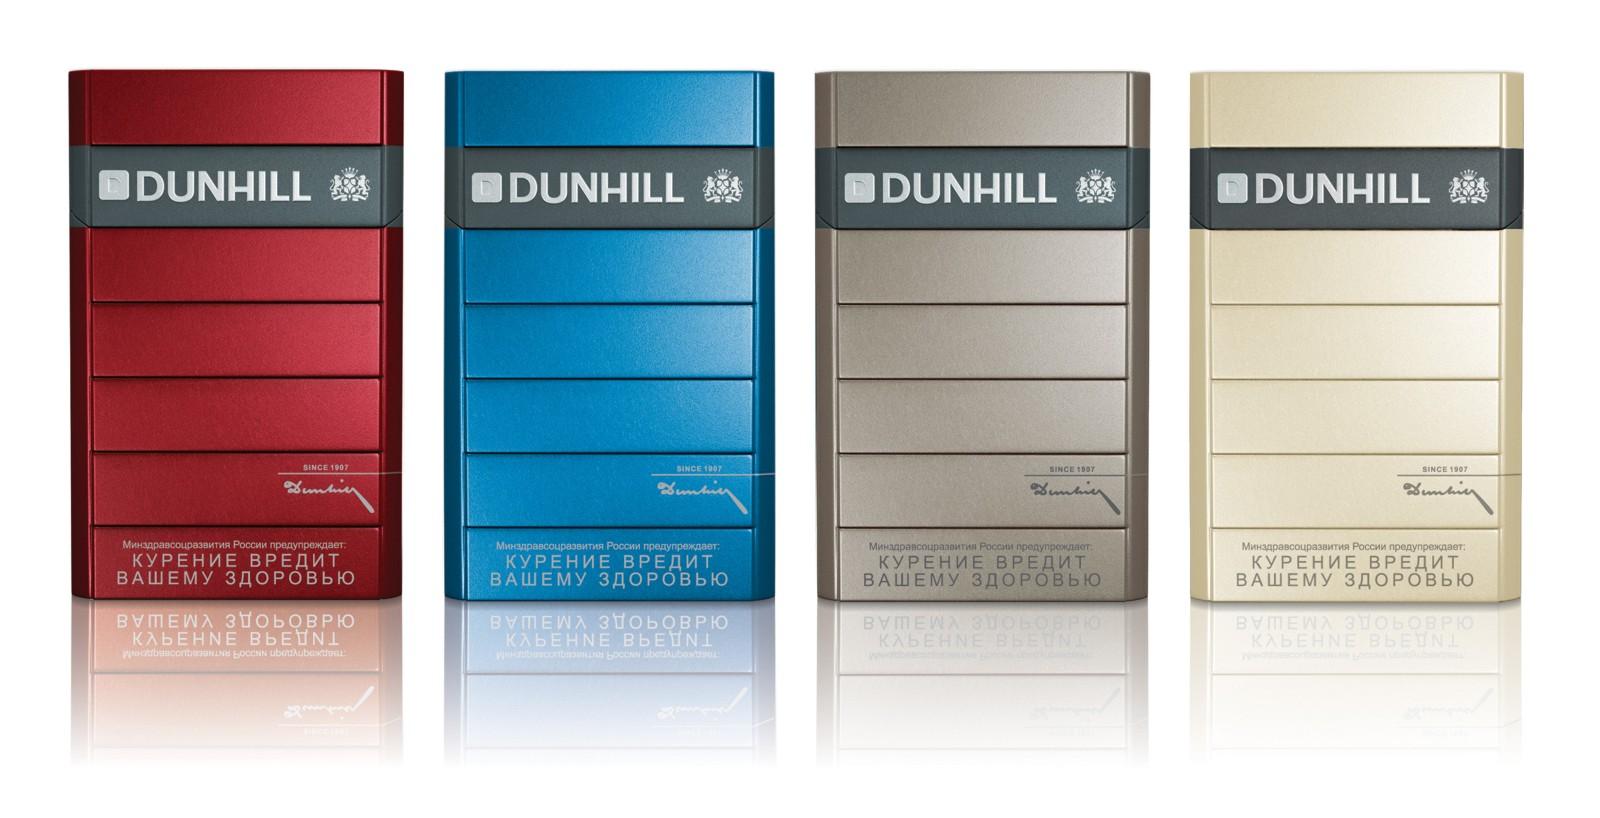 dunhill_new_designpack